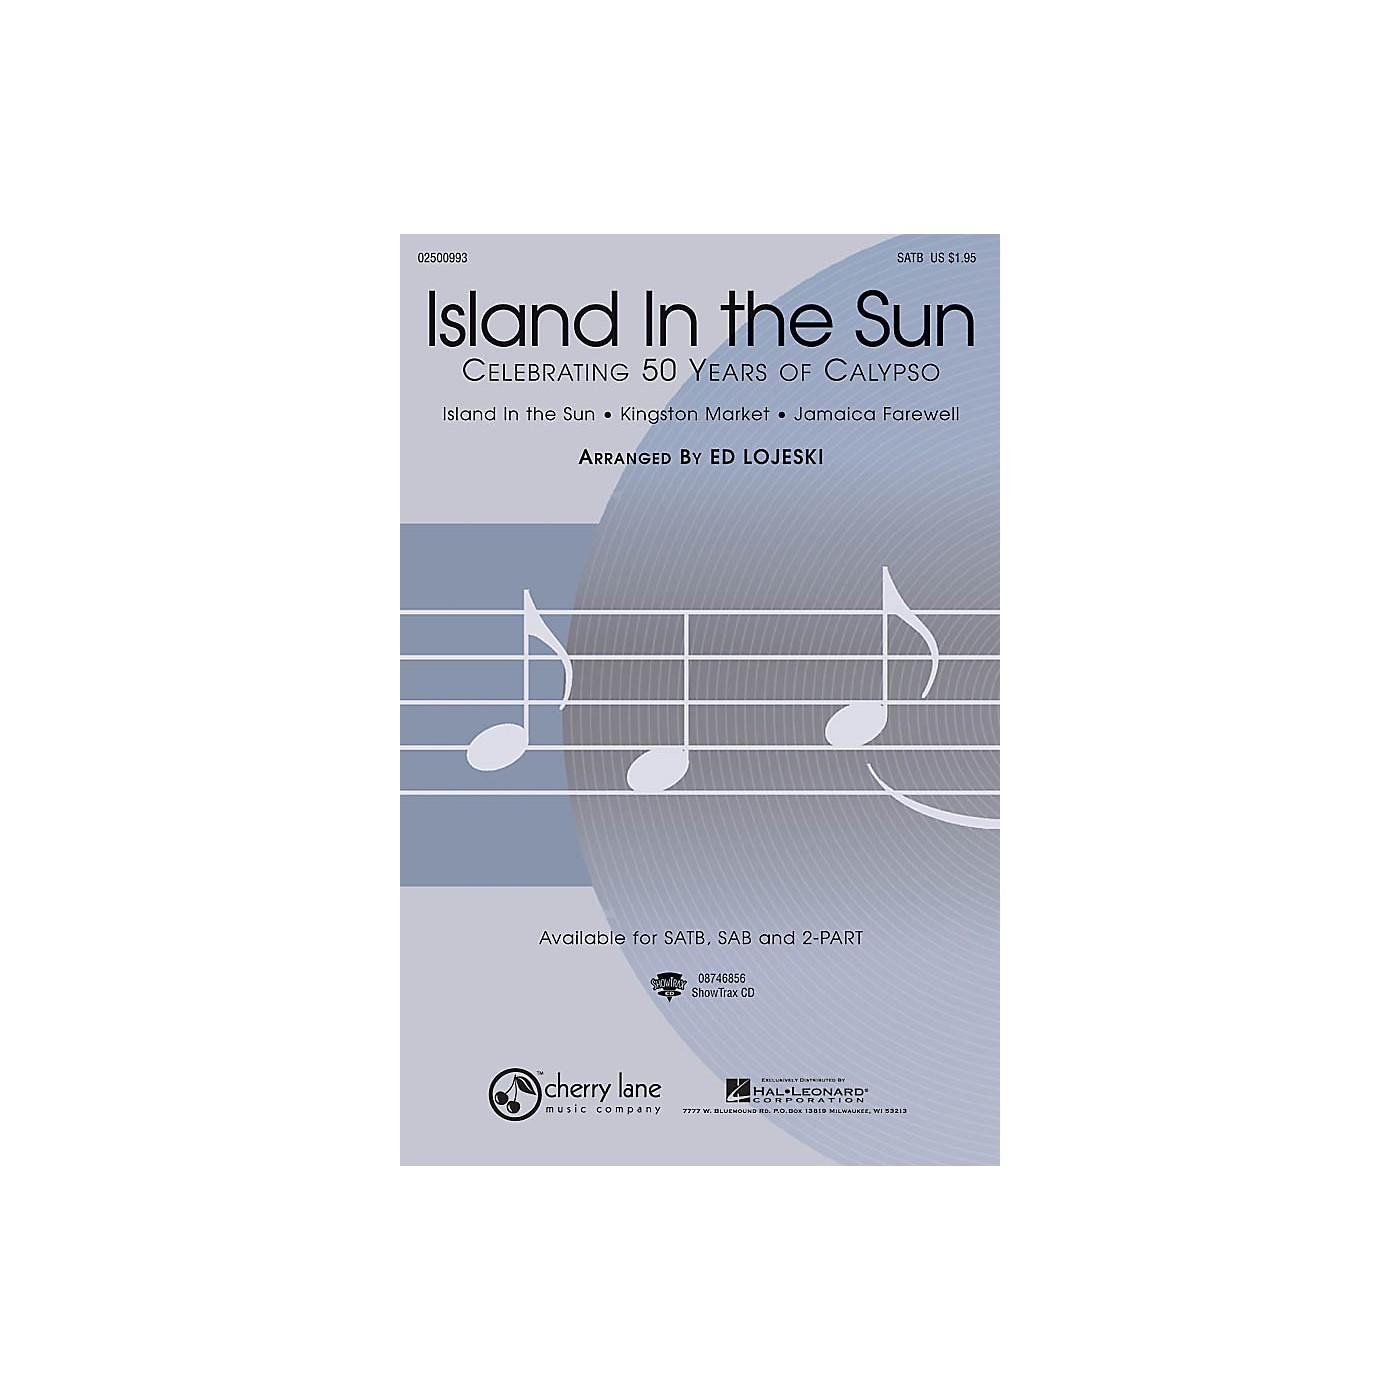 Hal Leonard Island in the Sun: Celebrating 50 Years of Calypso ShowTrax CD Arranged by Ed Lojeski thumbnail